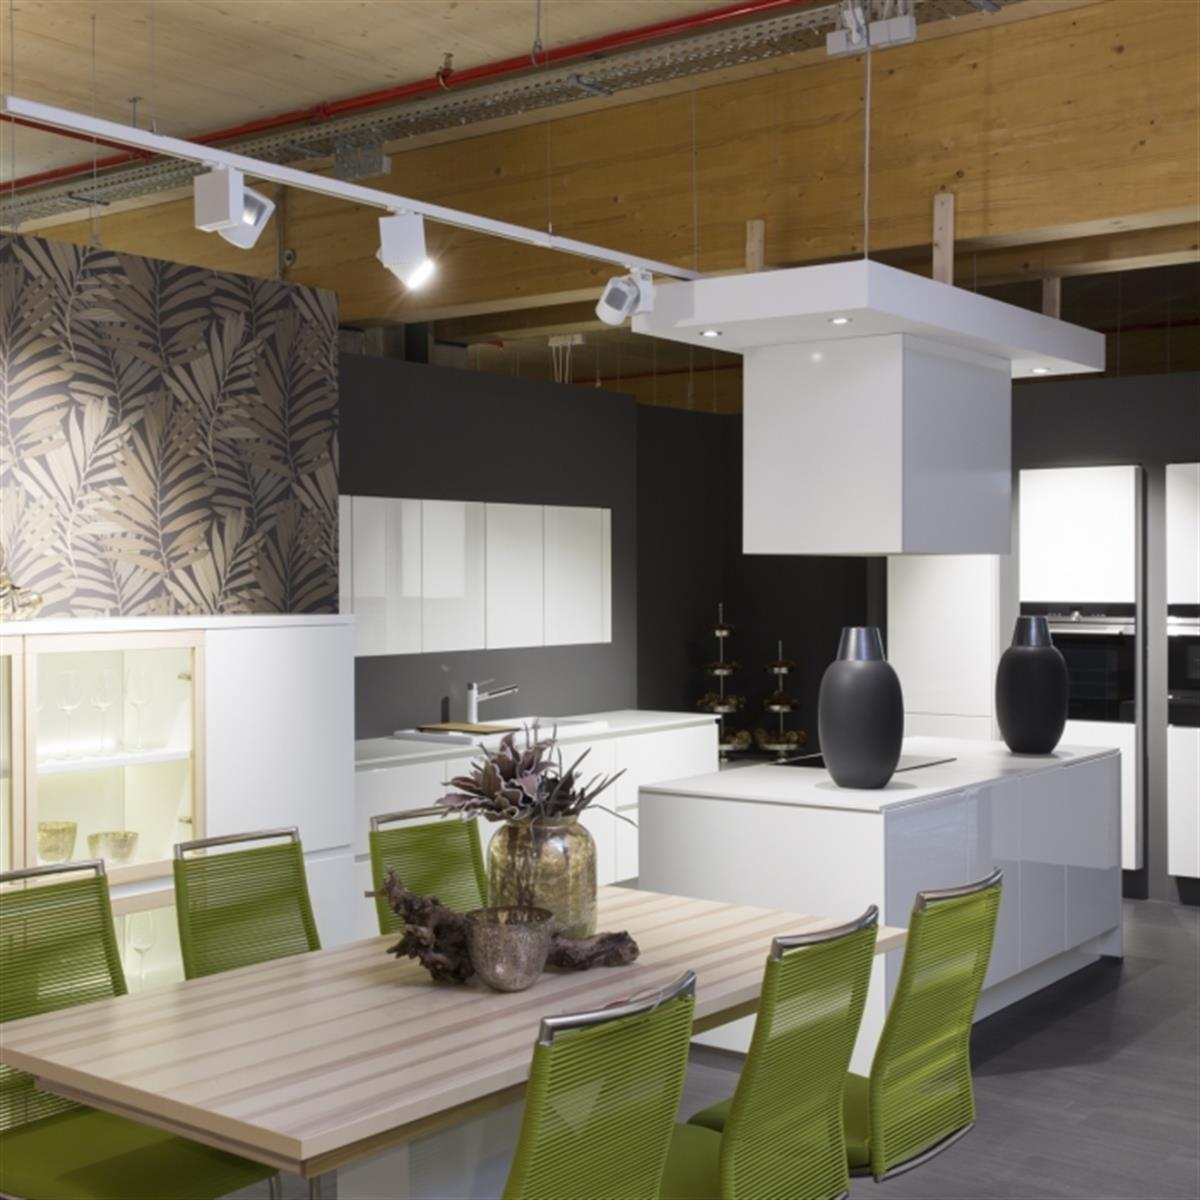 Oestreicher meubles cuisines wunnzemmermiwwel for Meubles wieder